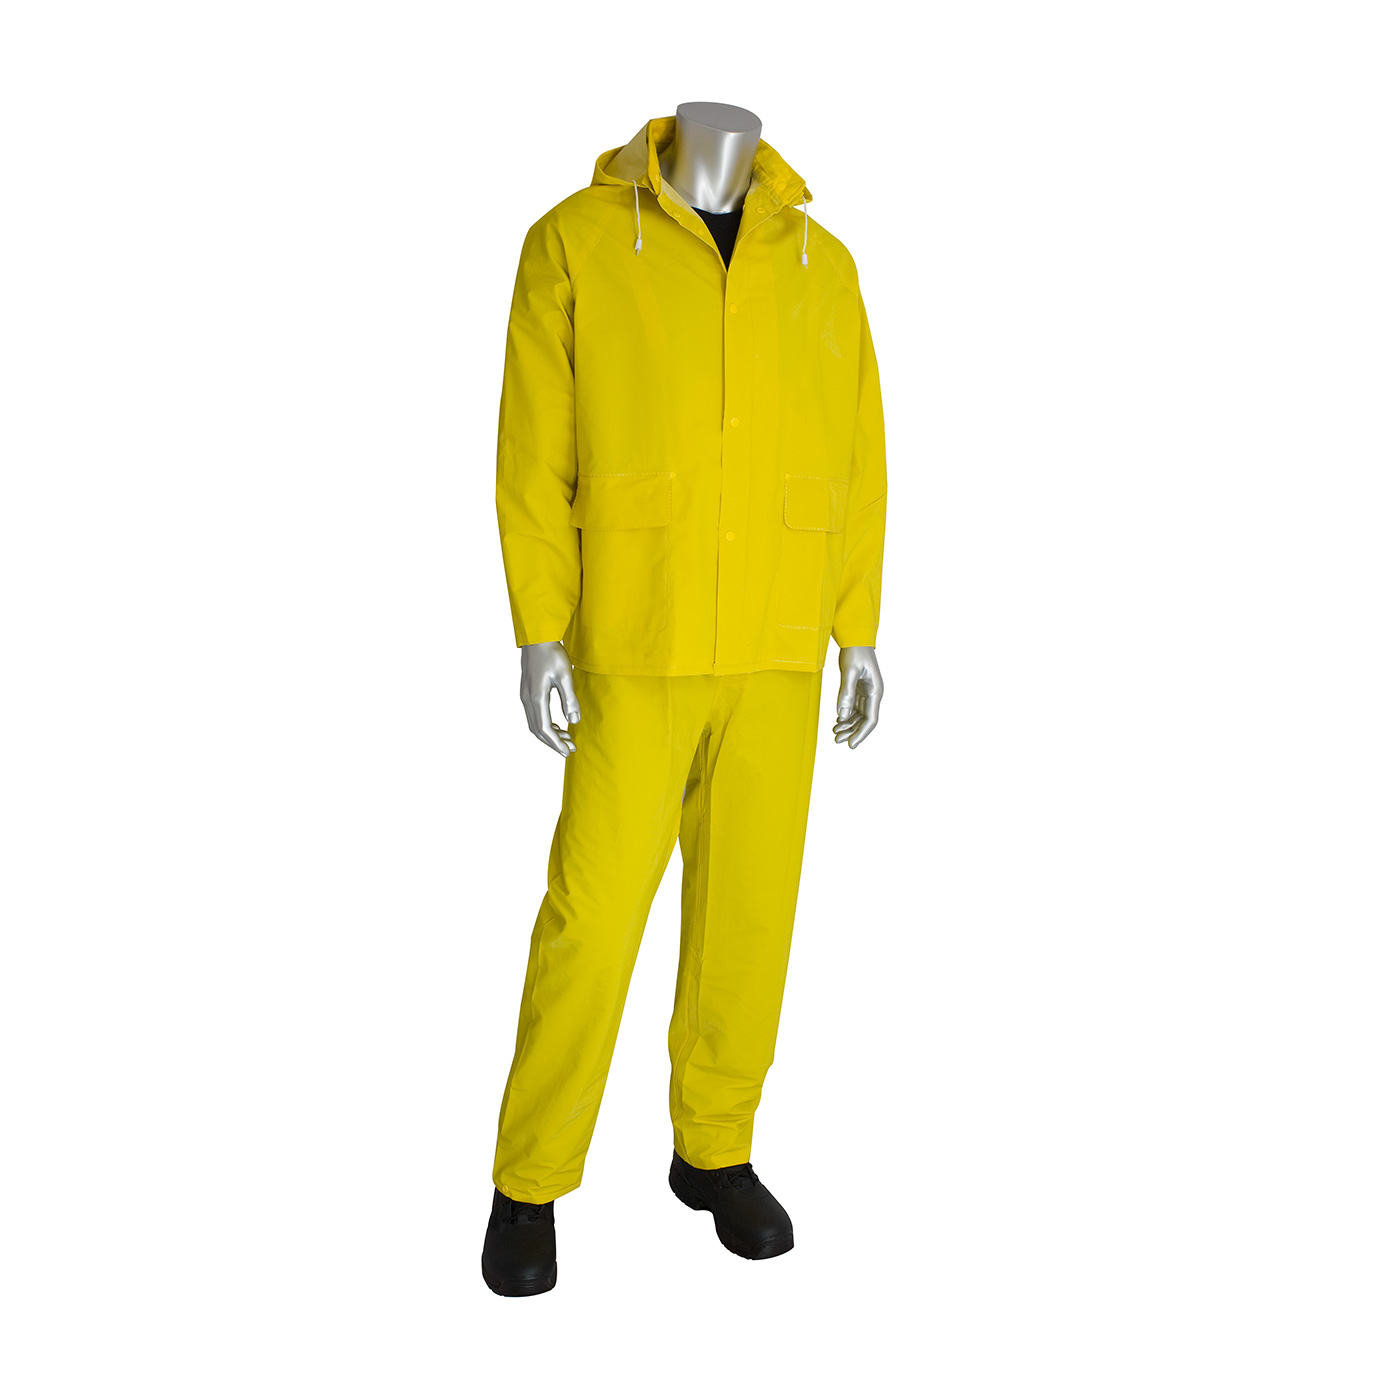 Opsial P702LUL Yellow Rain Suit, 3 piece